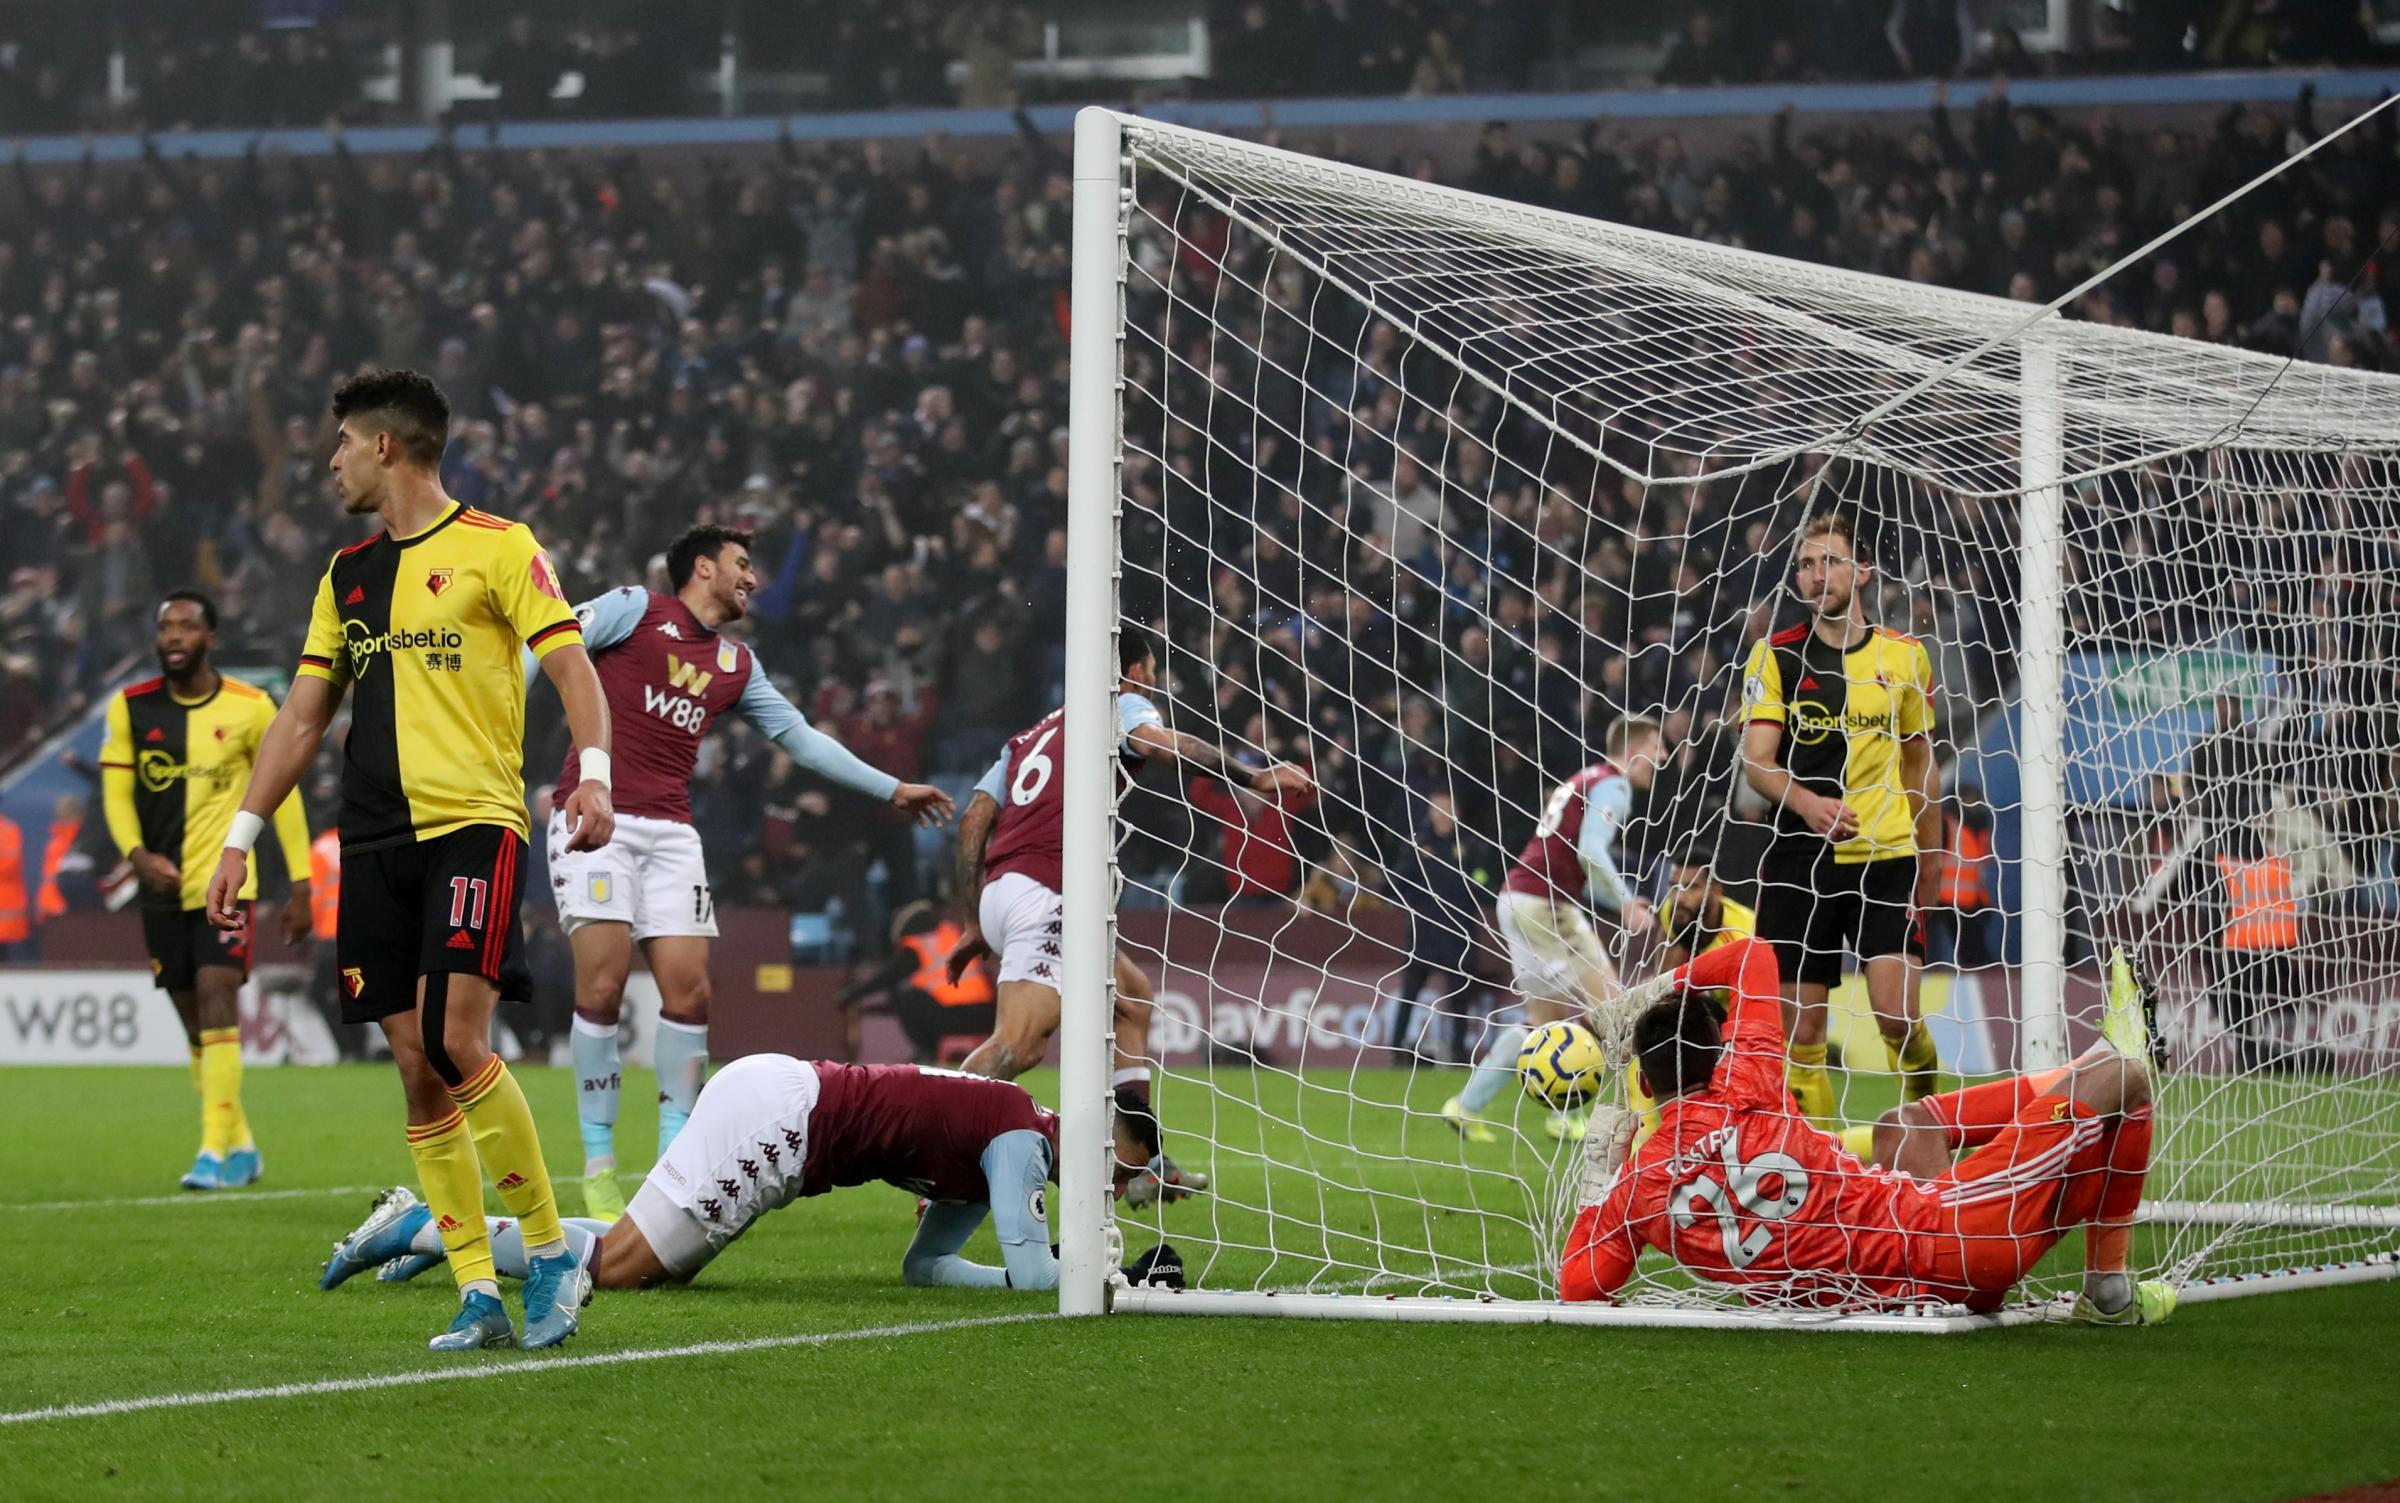 Watford throw away lead to lose at Aston Villa